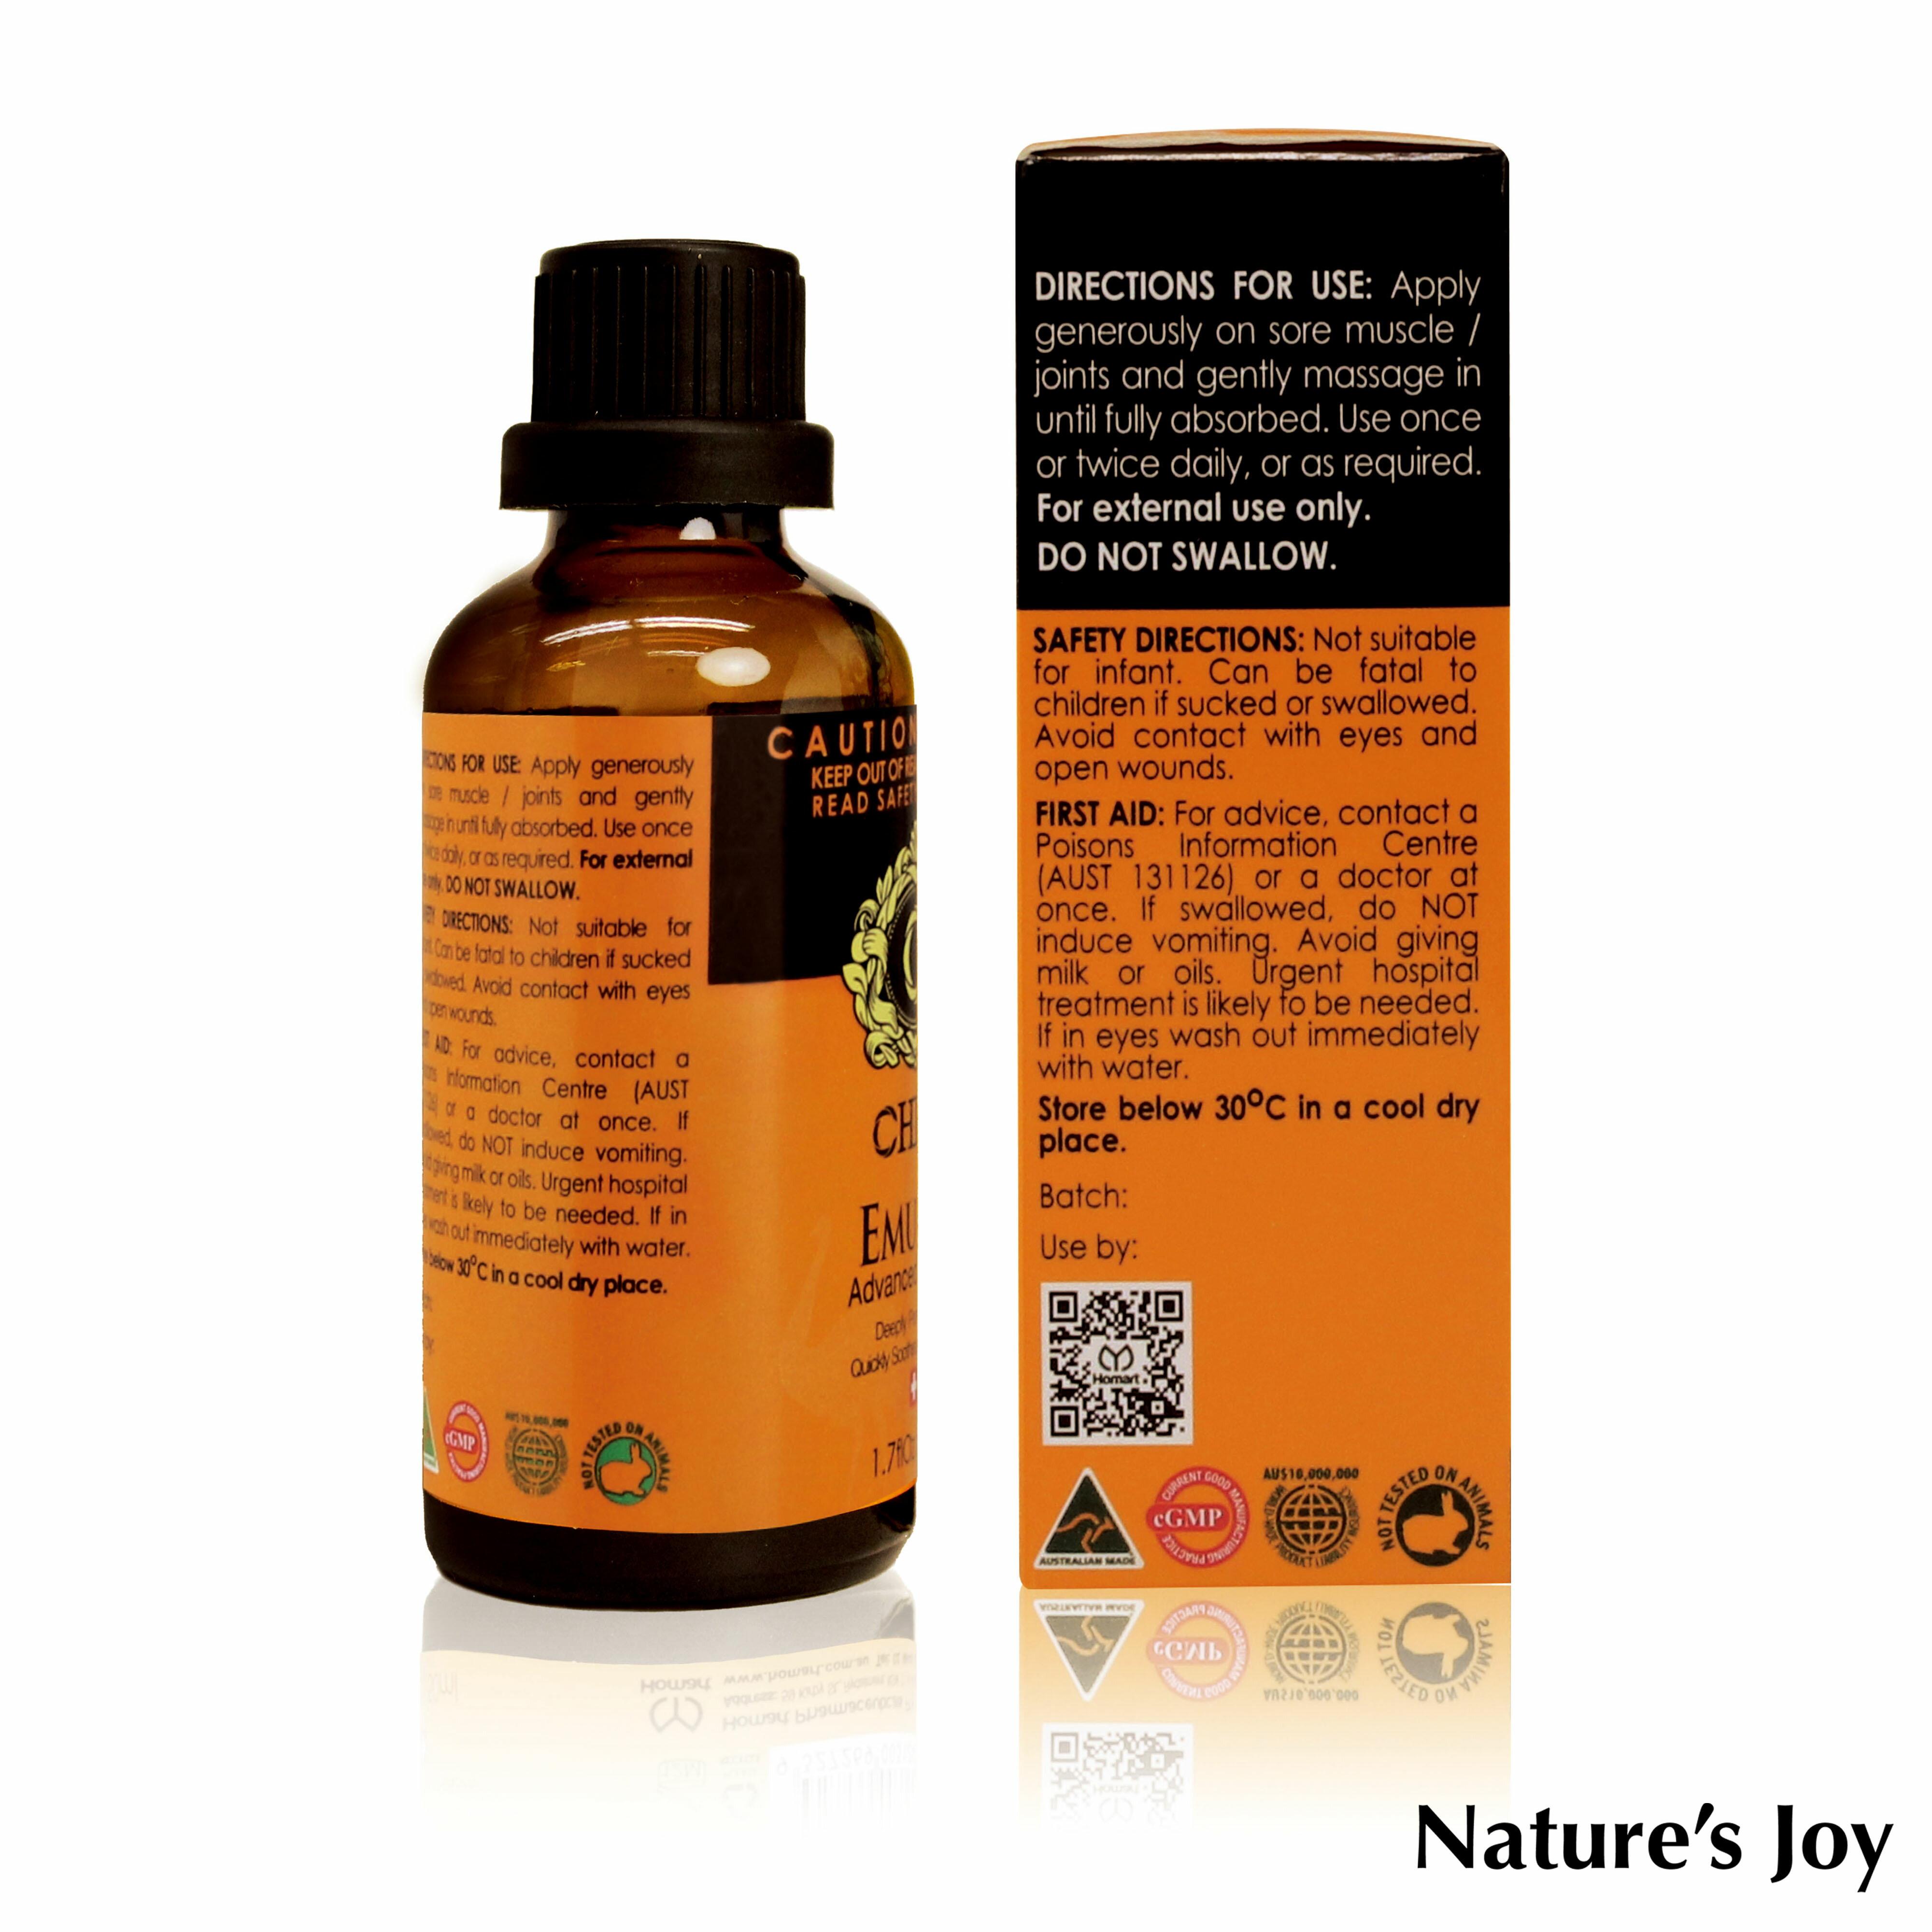 Nature's Joy 澳洲強效鴯鶓精油 / 澳洲維骨力 外用 / 澳洲原裝 / 推拿大師 / 舒緩精油 / 按摩油 2